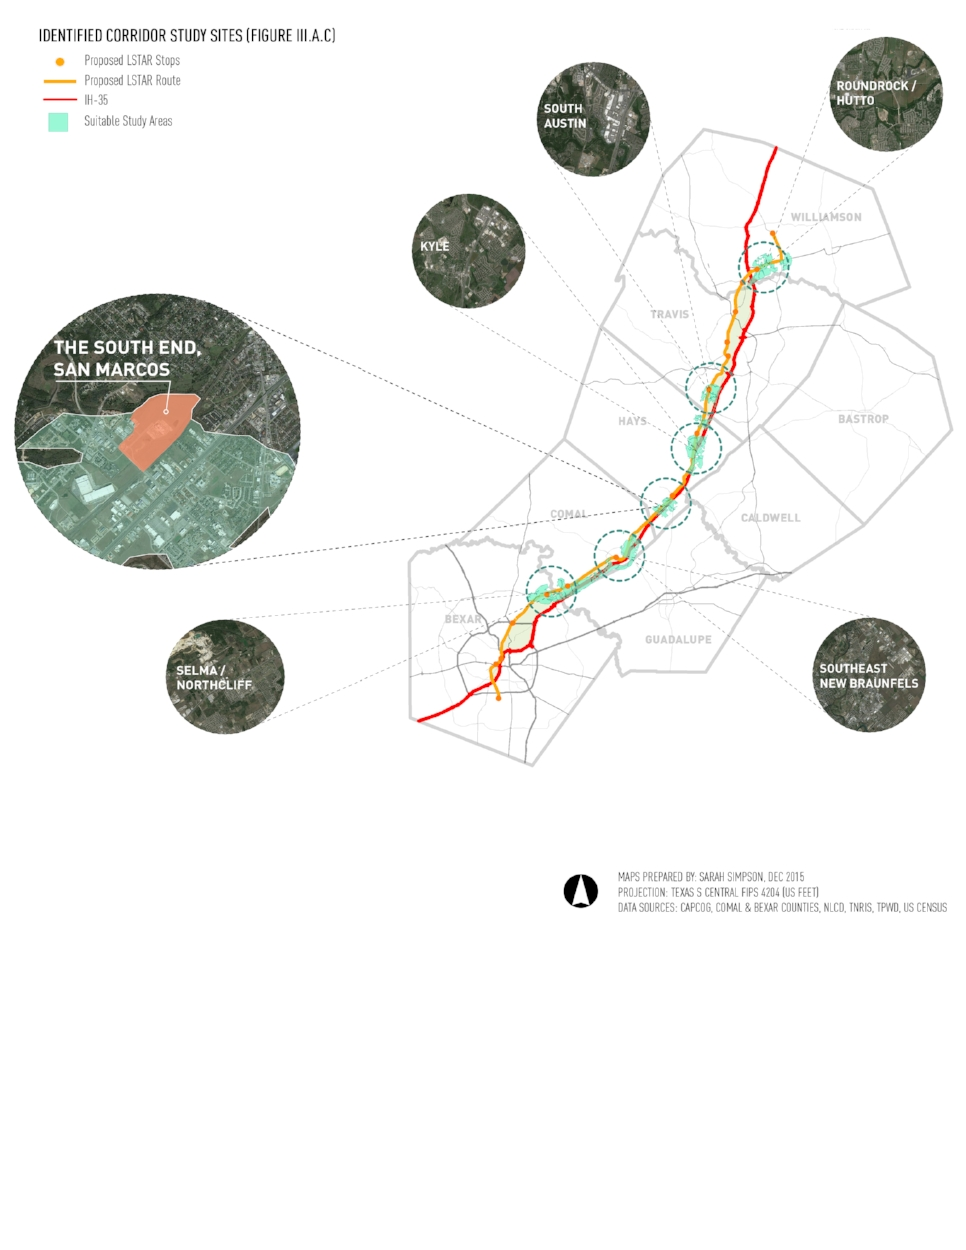 SLS MDS Final GIS Sites 8.5x11-32.jpg